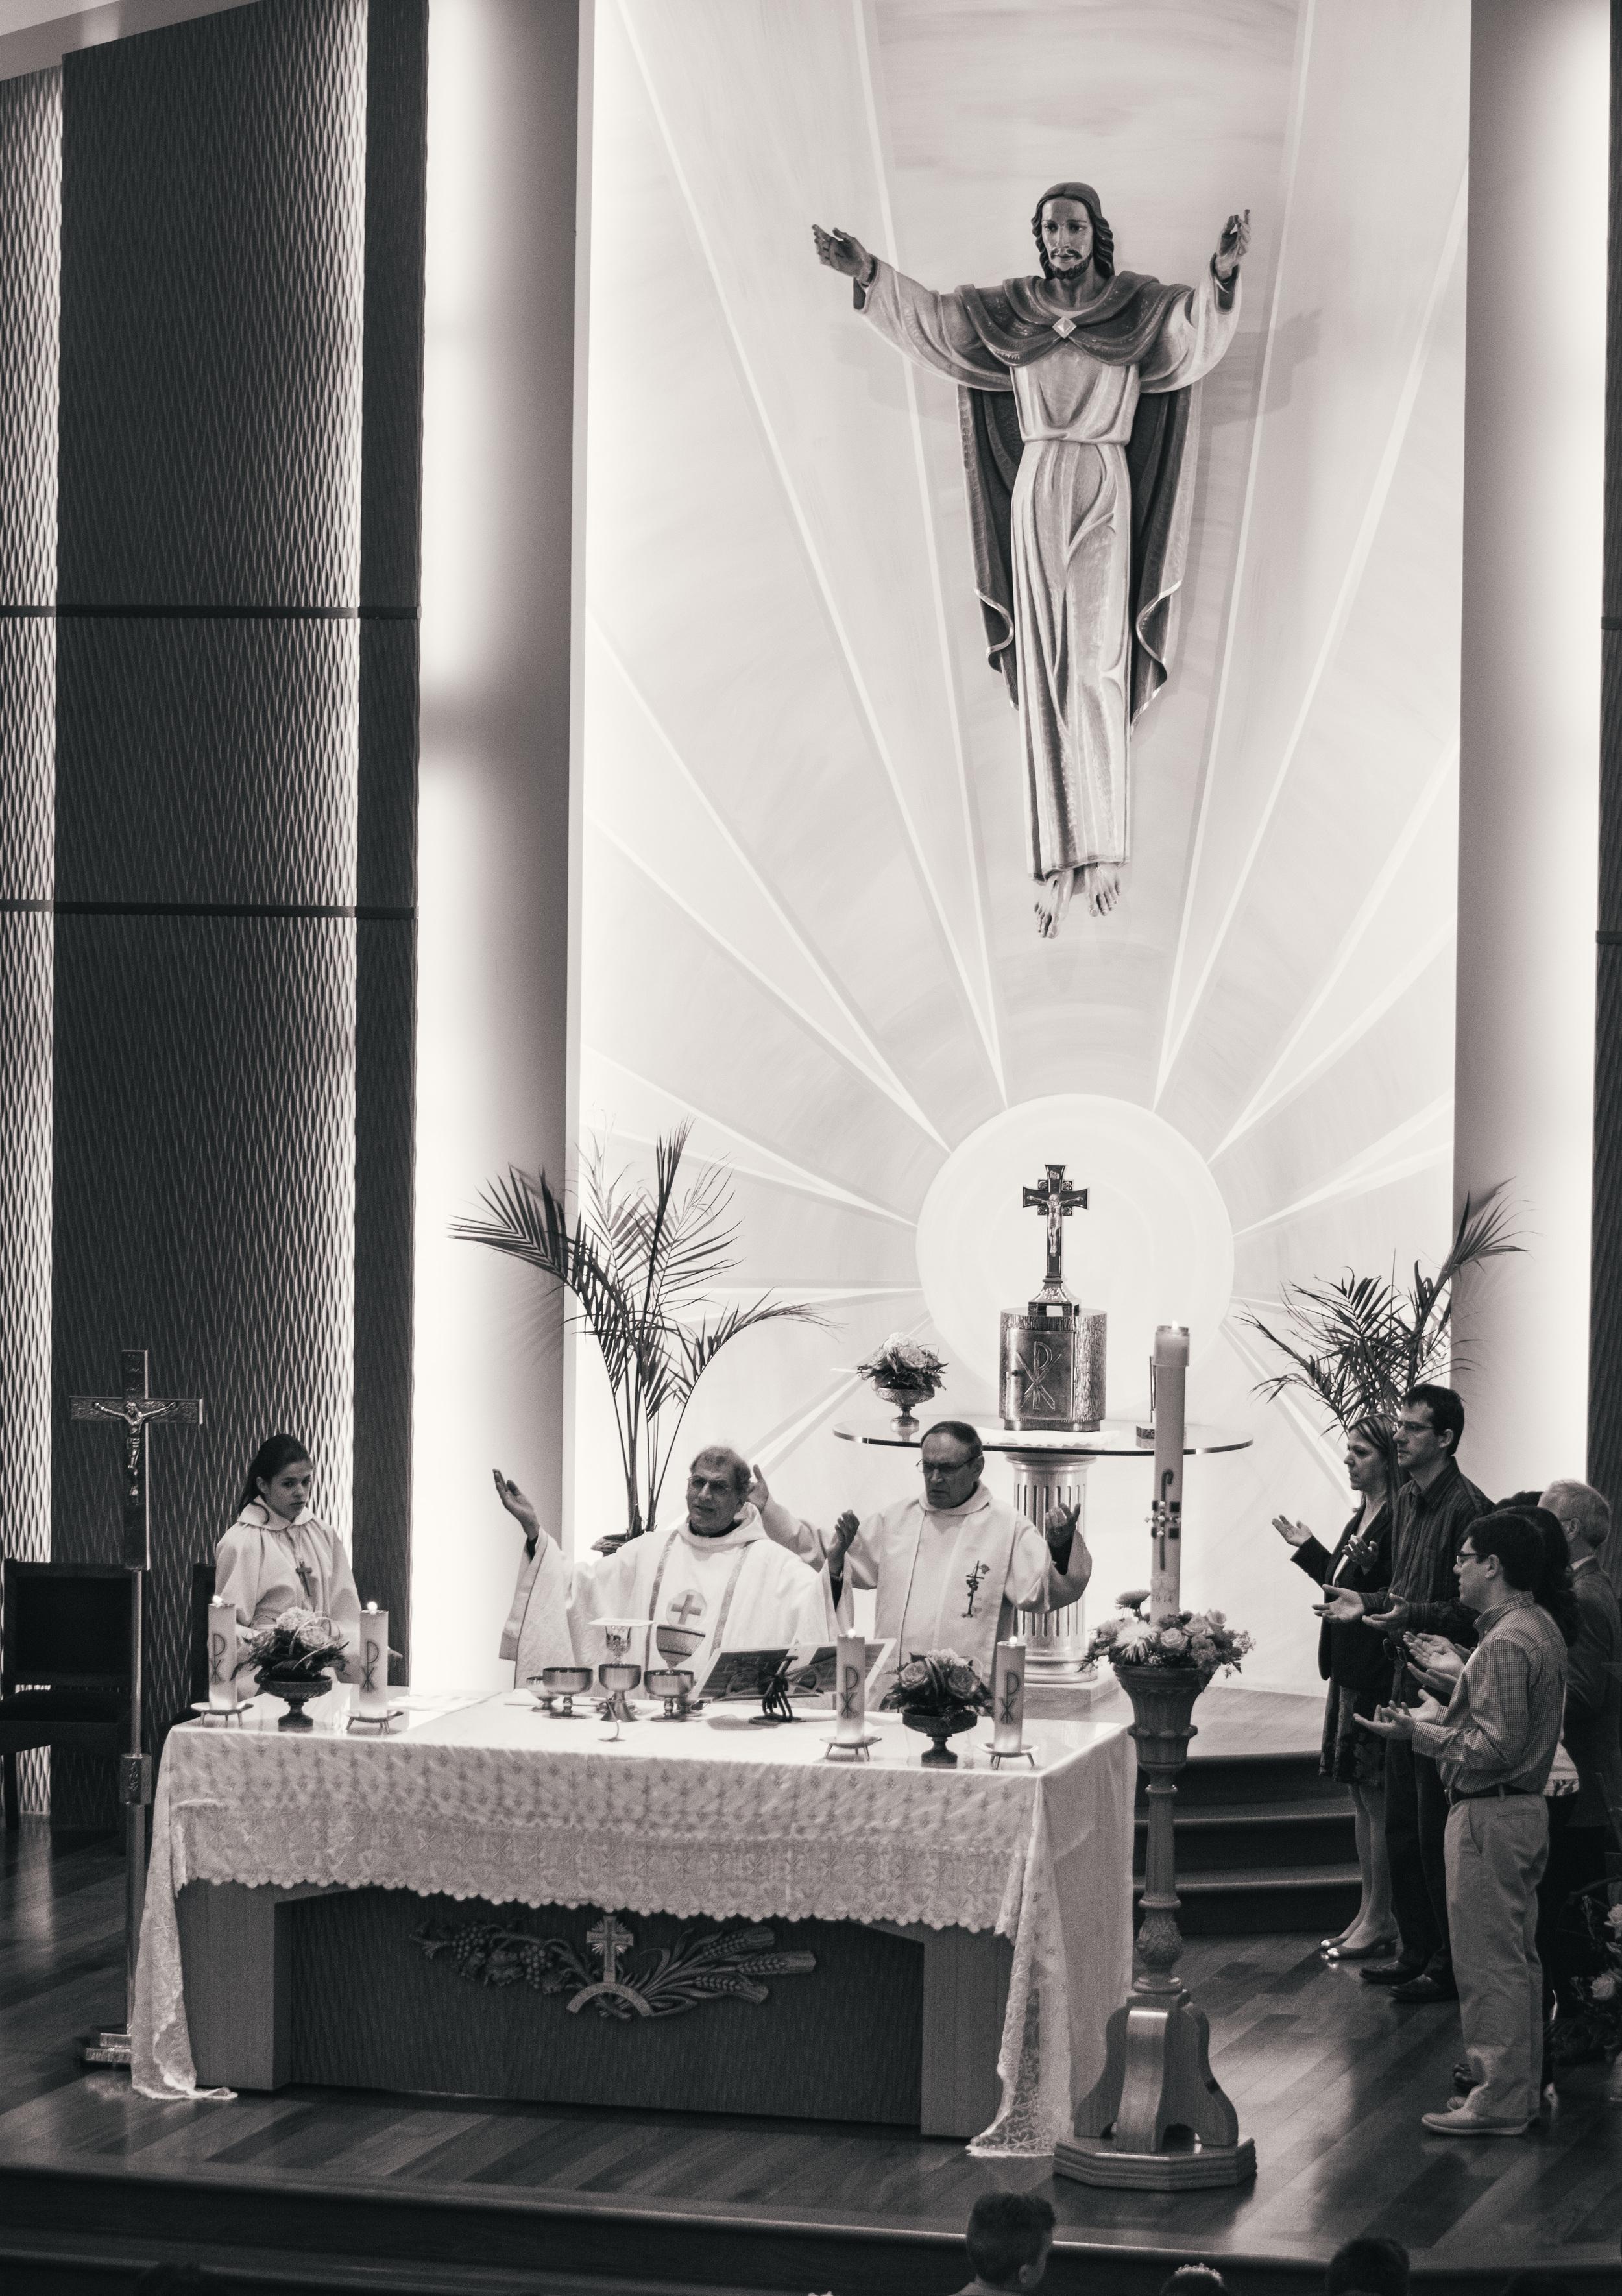 Elyana_First_Communion-30.jpg